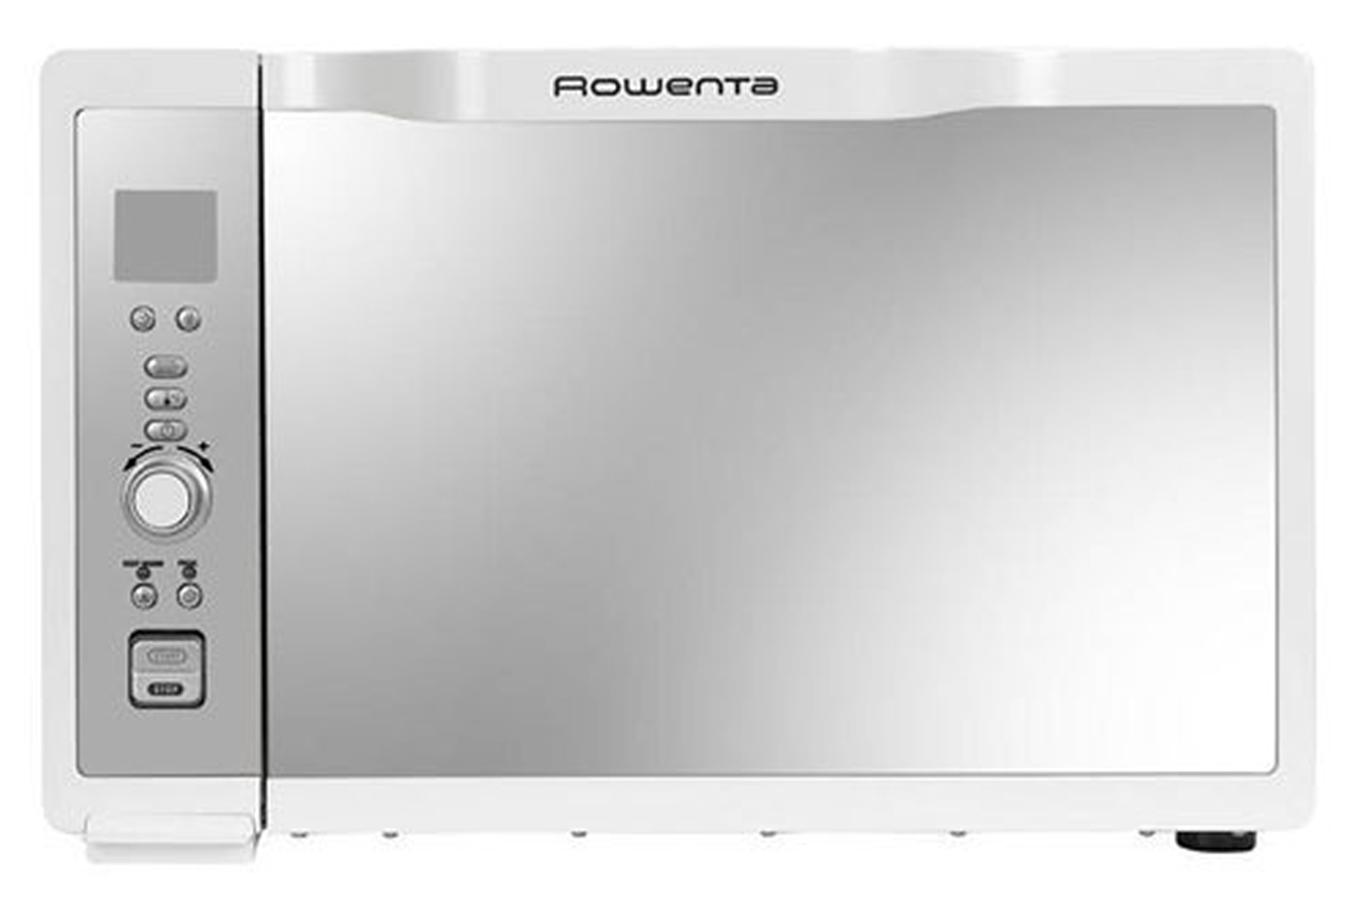 mini four four posable rowenta oc789130 pro vapeur 3343685 darty. Black Bedroom Furniture Sets. Home Design Ideas